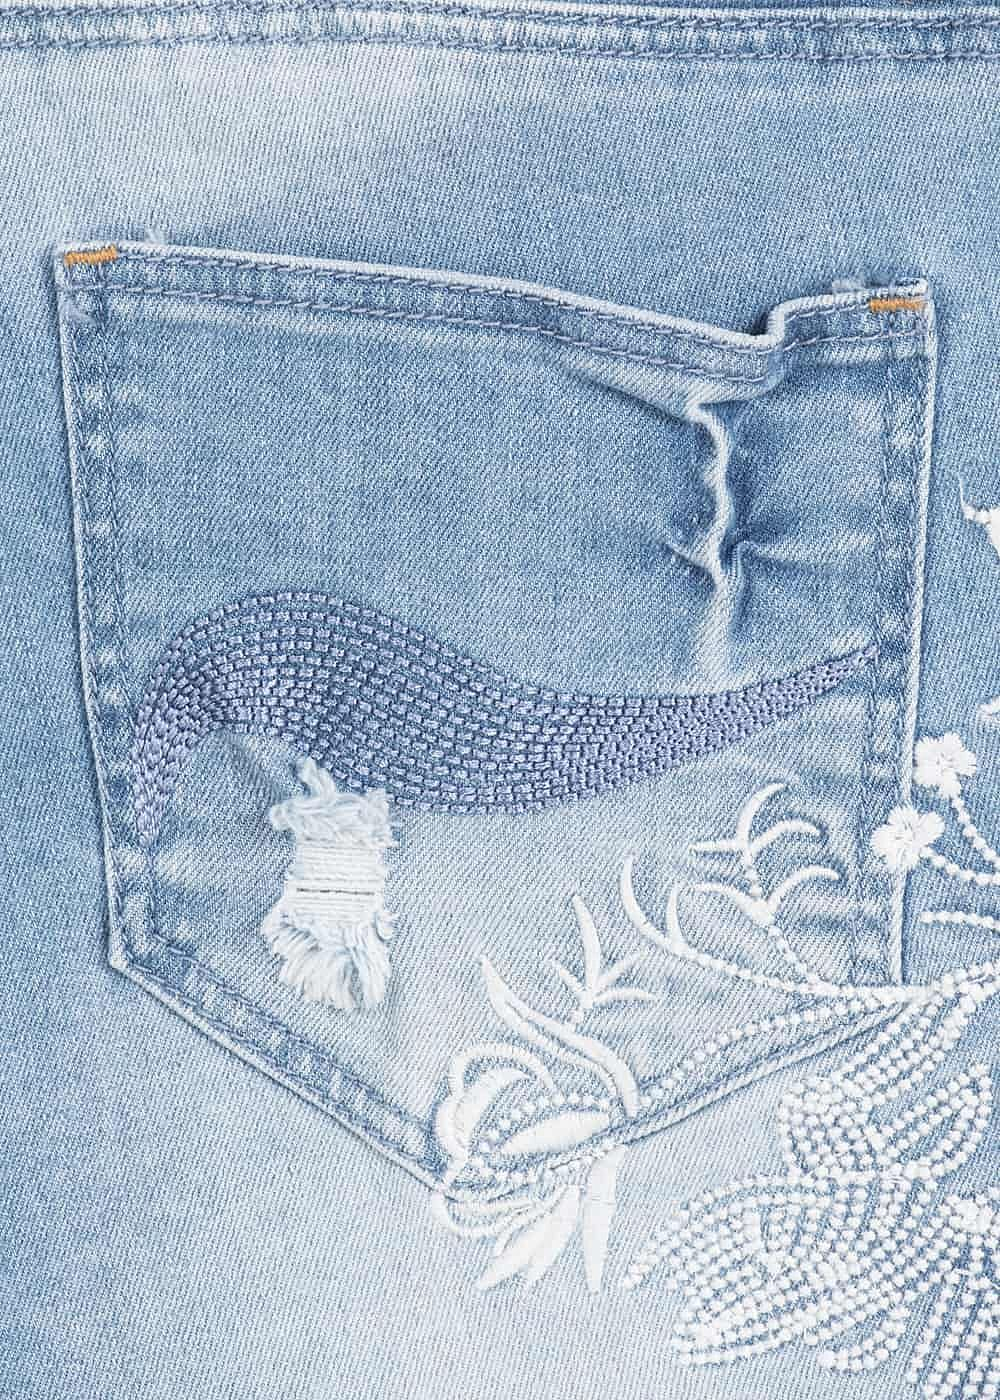 7f56ca6dbbb564 Aiki Damen Jeans Short 5-Pockets Blumen Patch Fransen hell blau ...